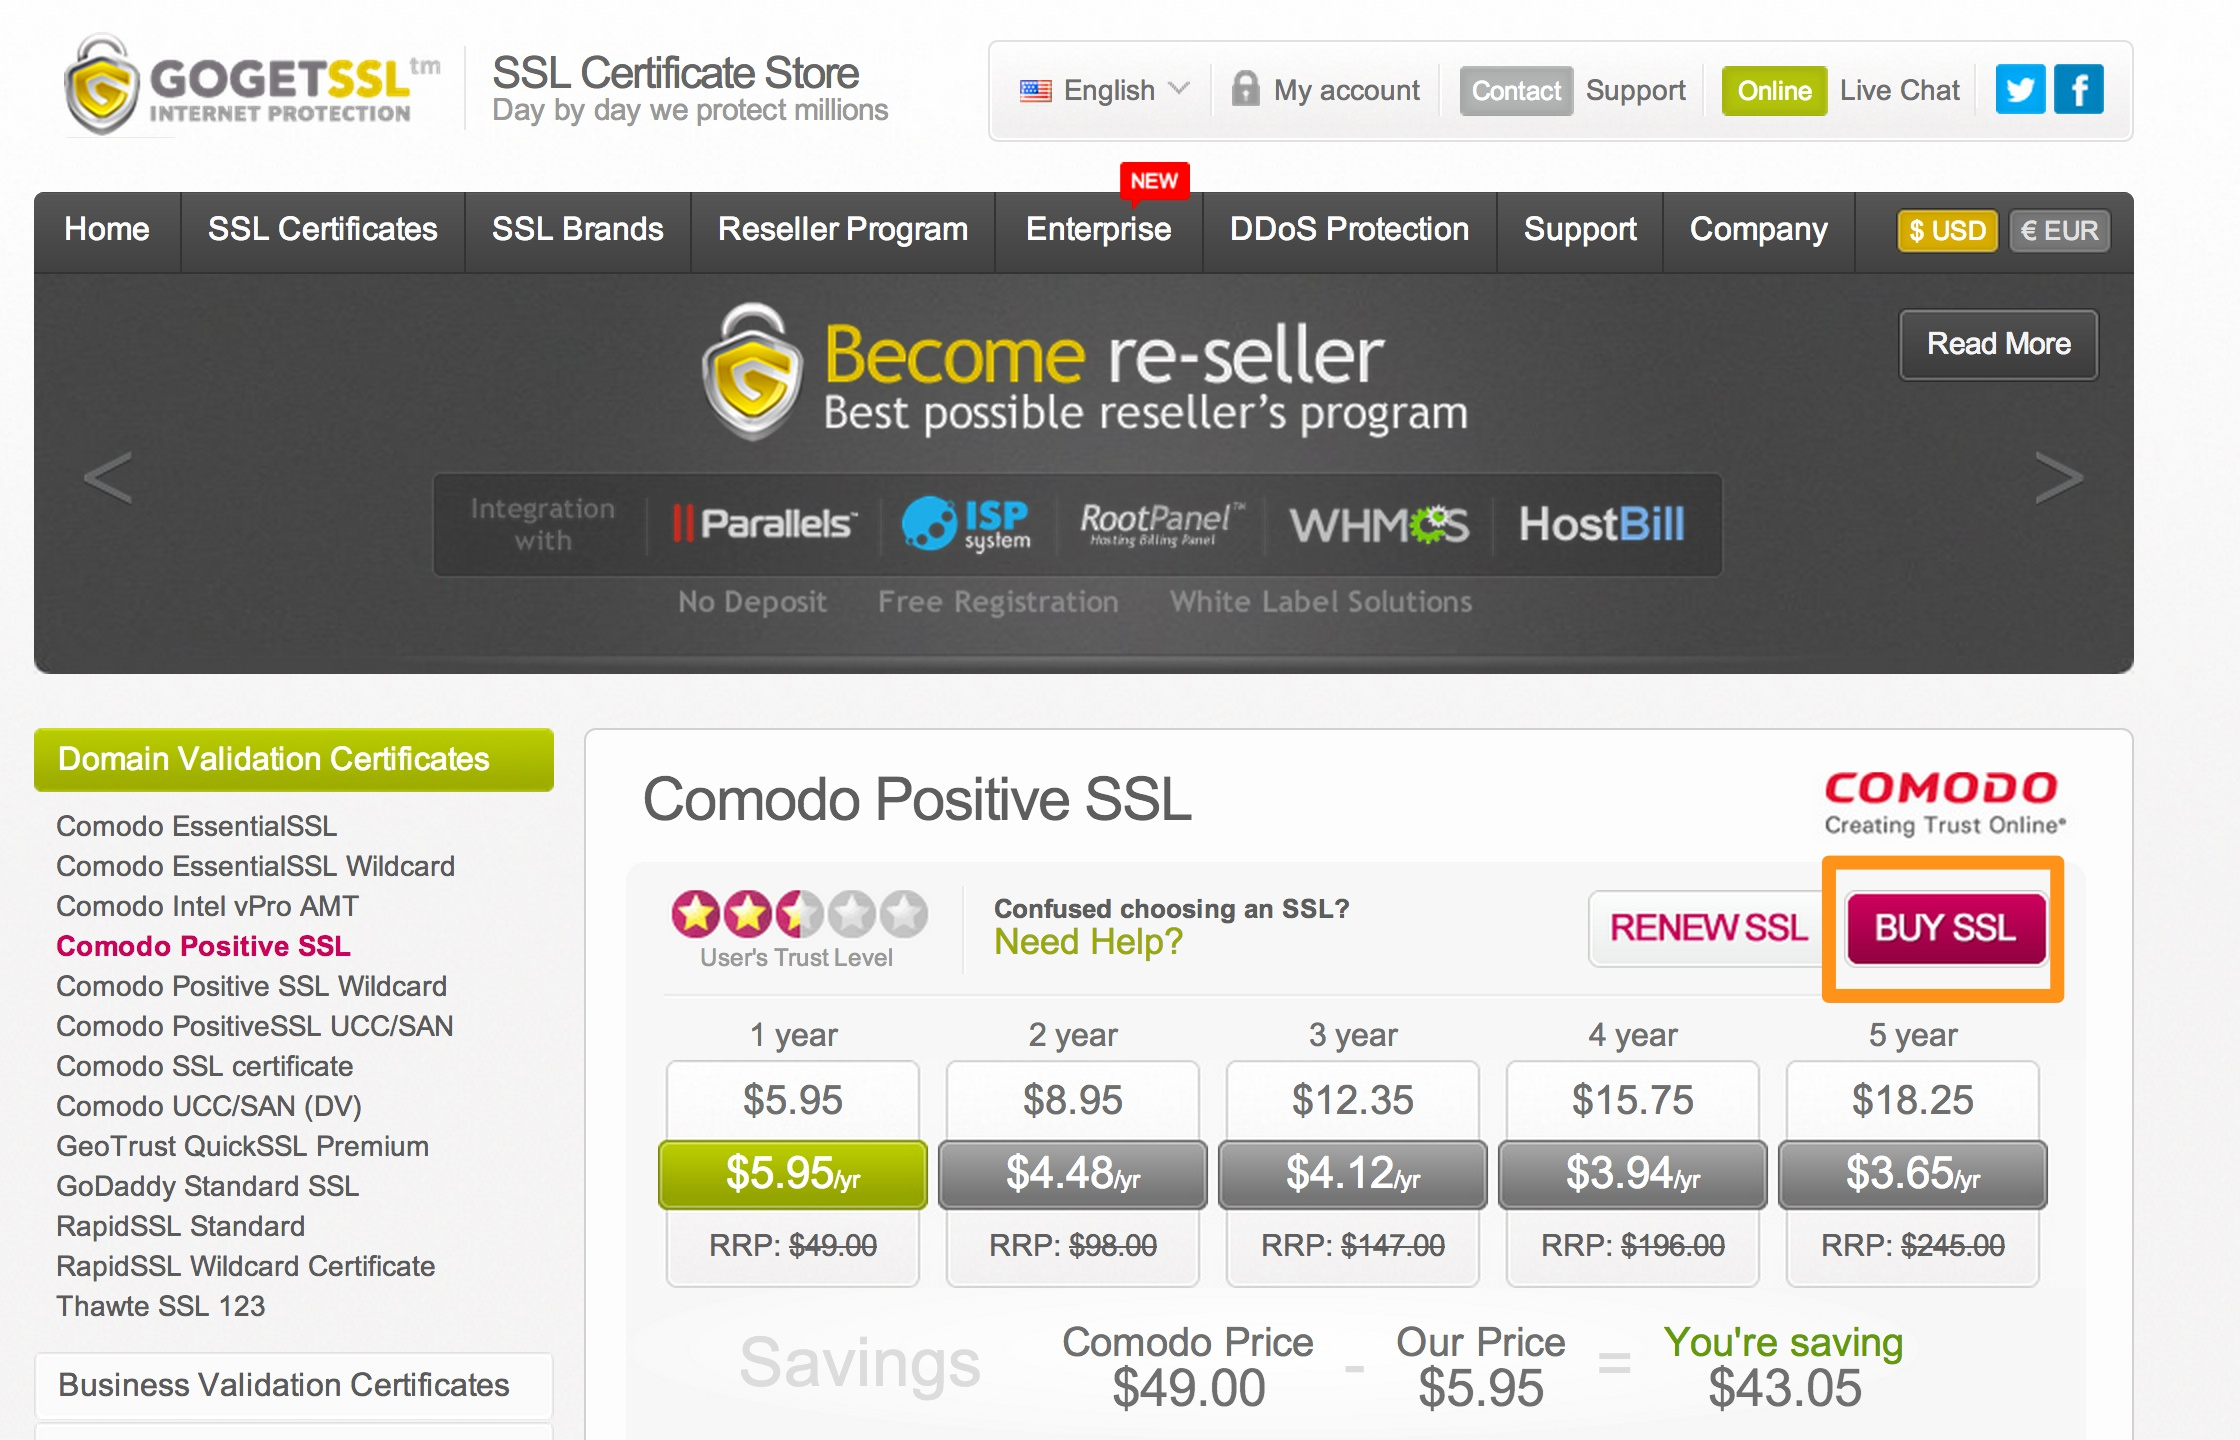 Cheap_Comodo_Positive_SSL_starting_at__3_65_year1.jpg